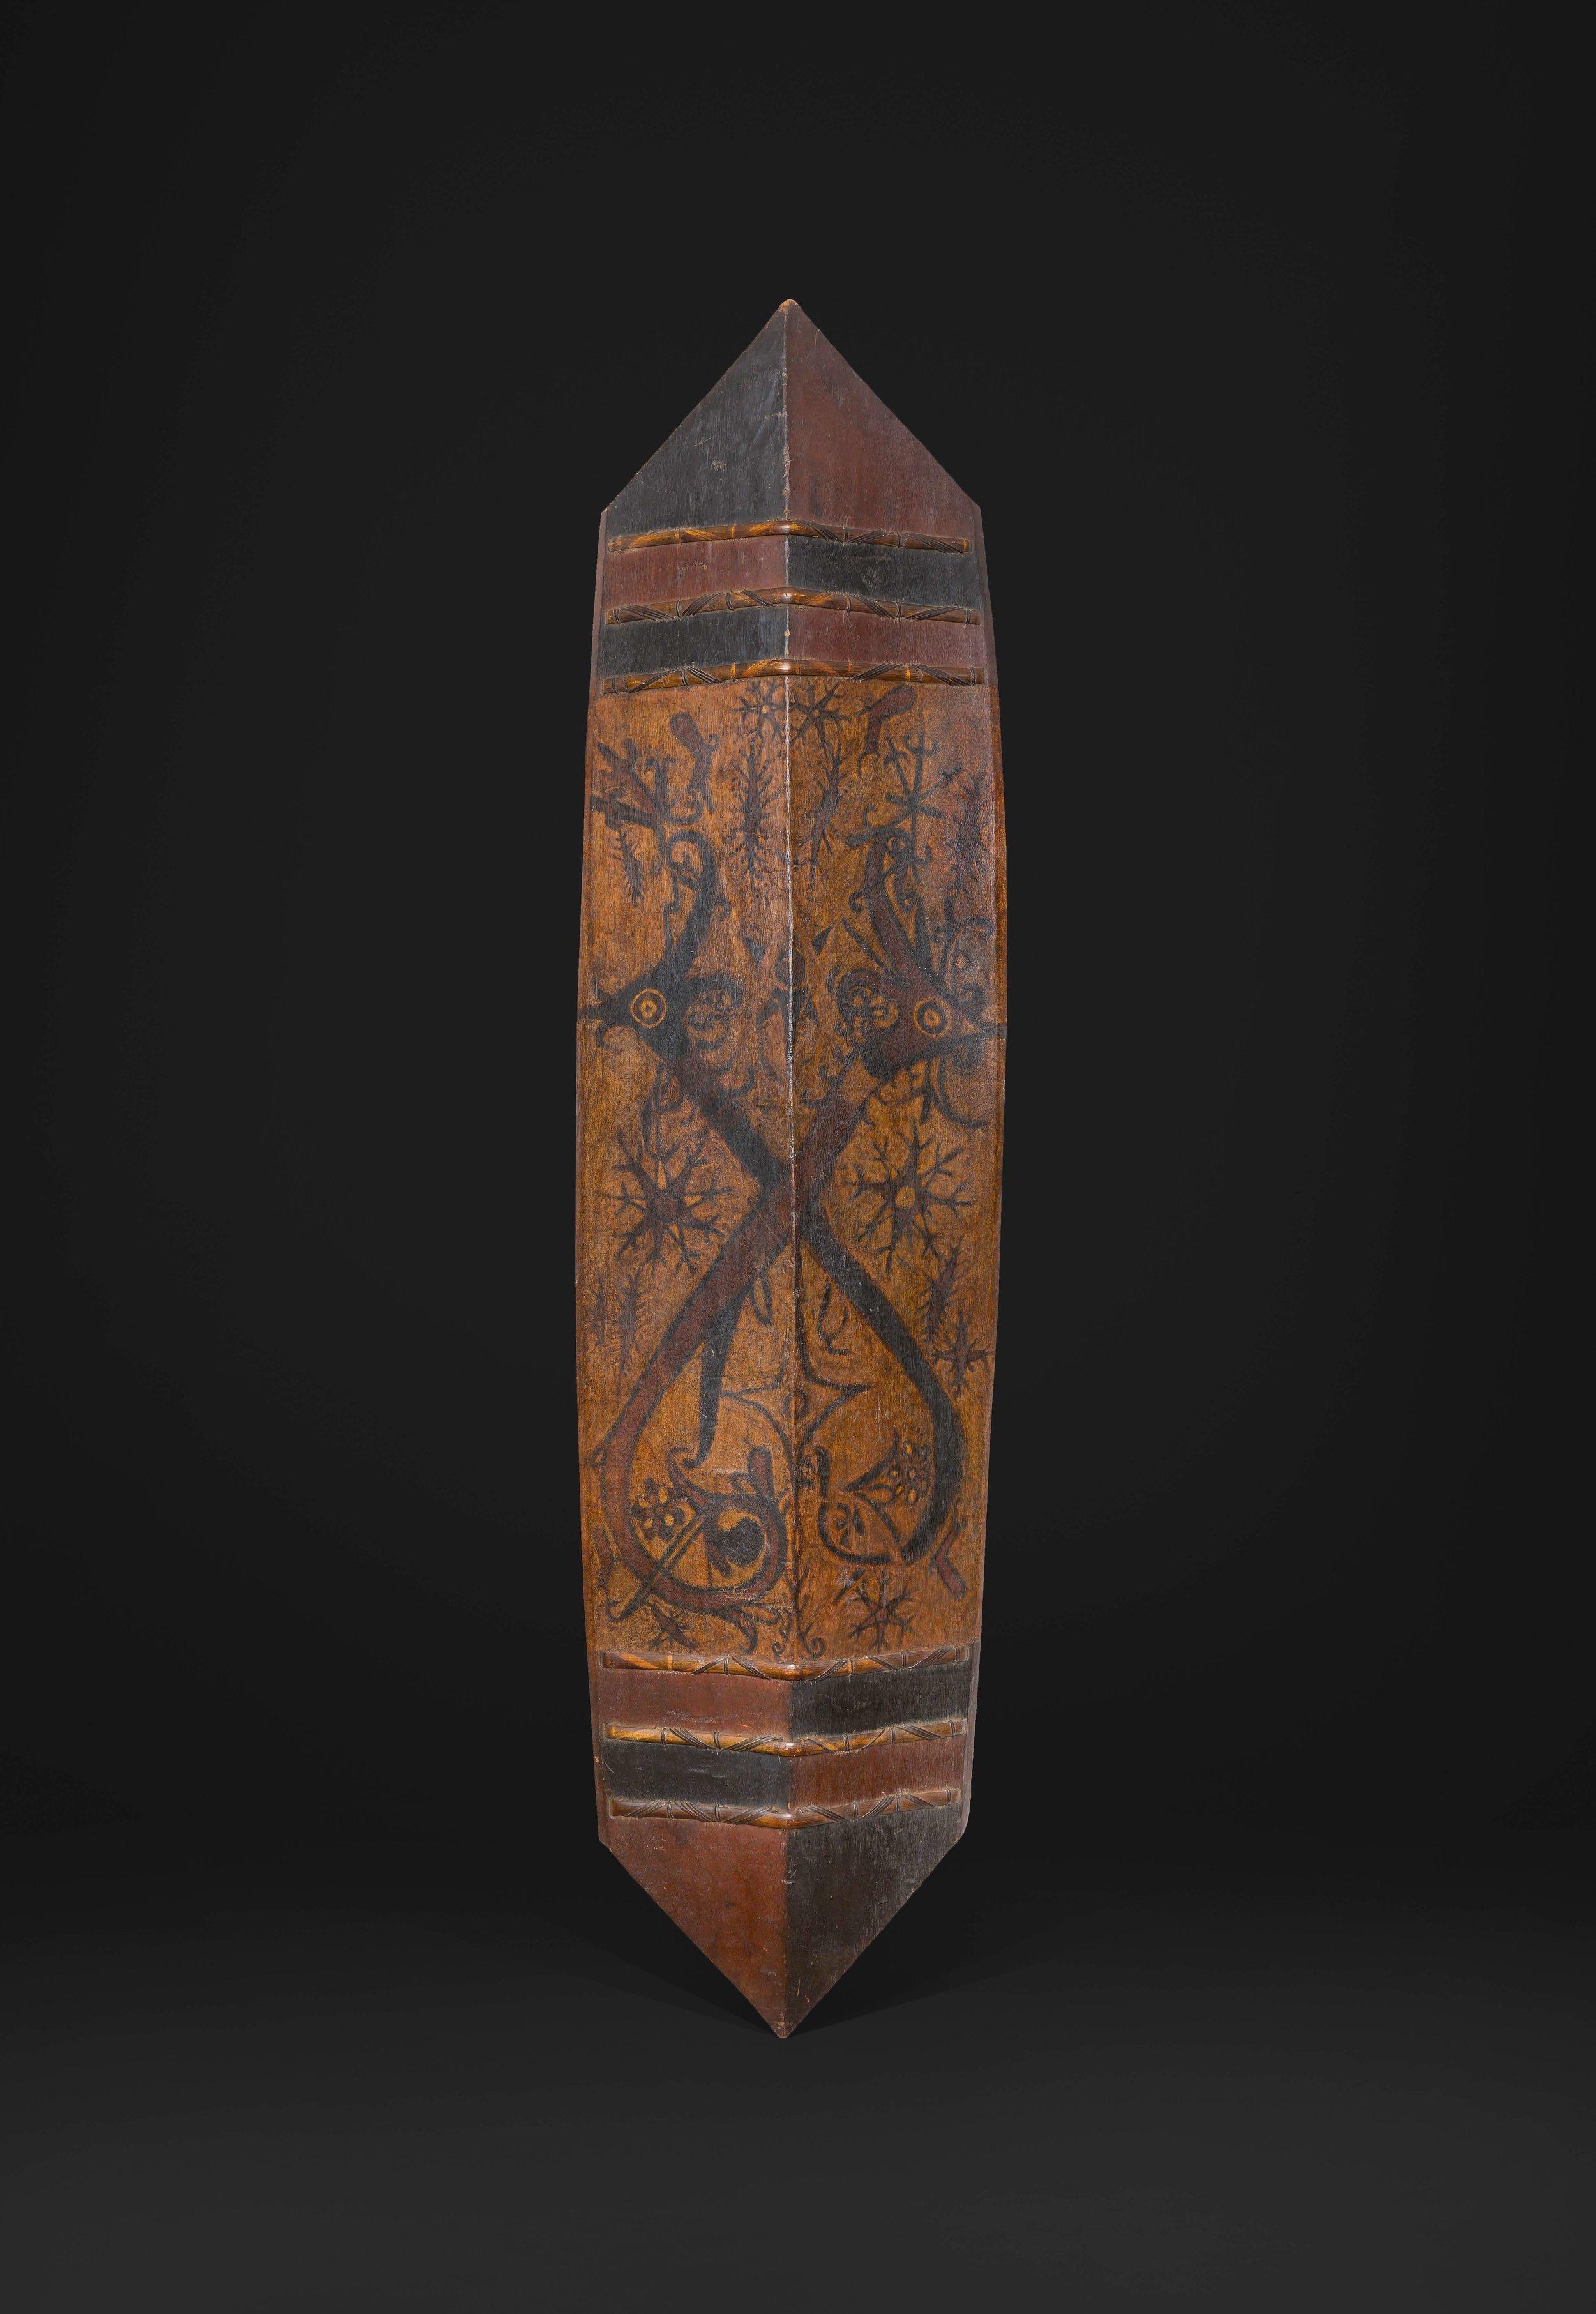 Dayak, possibly Ngaju, 19th century. Image courtesy of Bill Evans